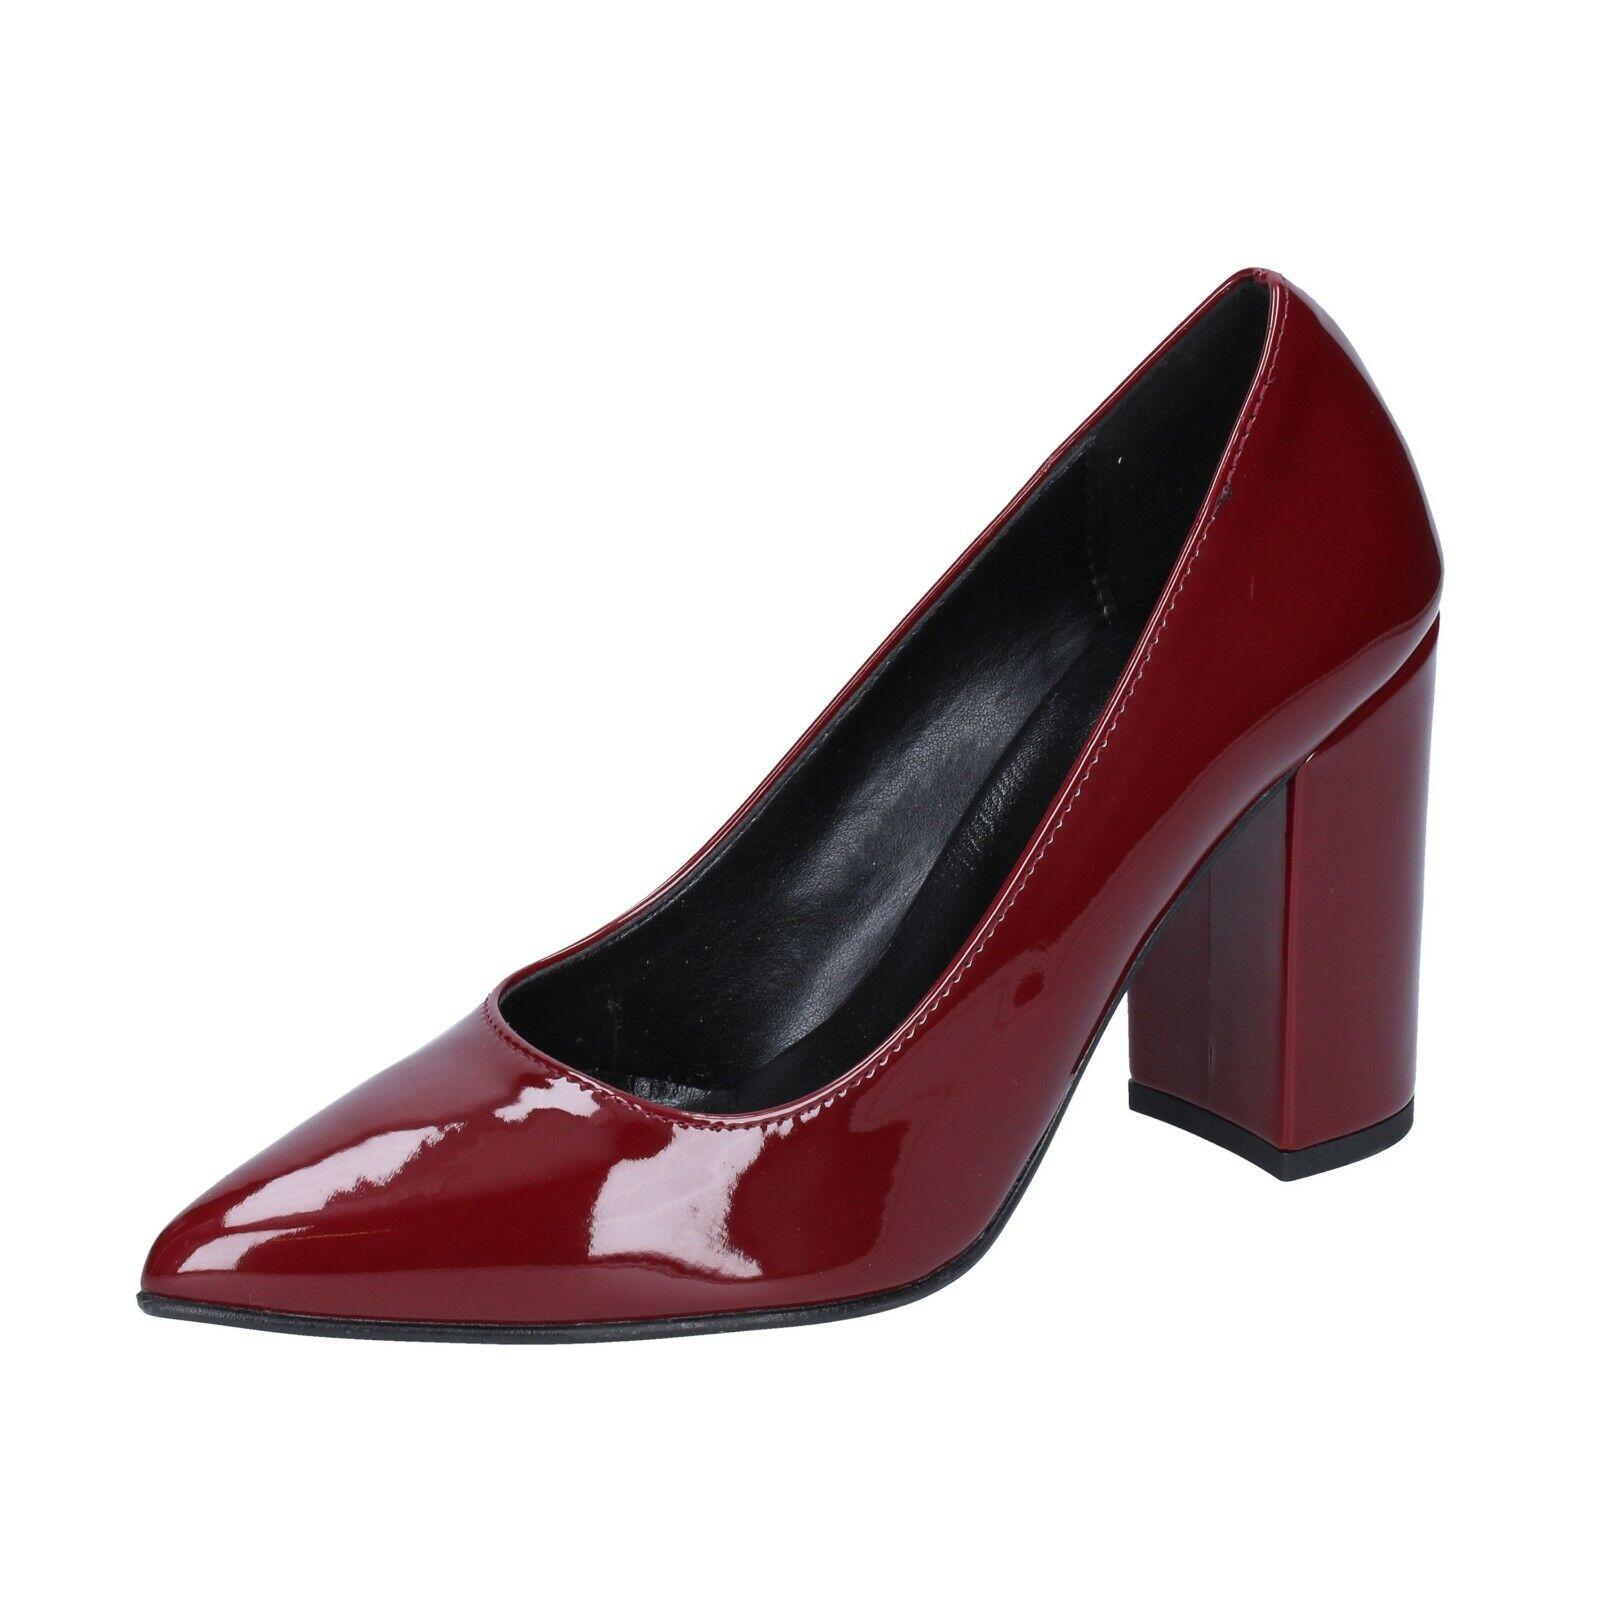 Chaussures femmes Olga Rubini 3 (UE 36) tribunaux Bordeaux Cuir verni BS866-36